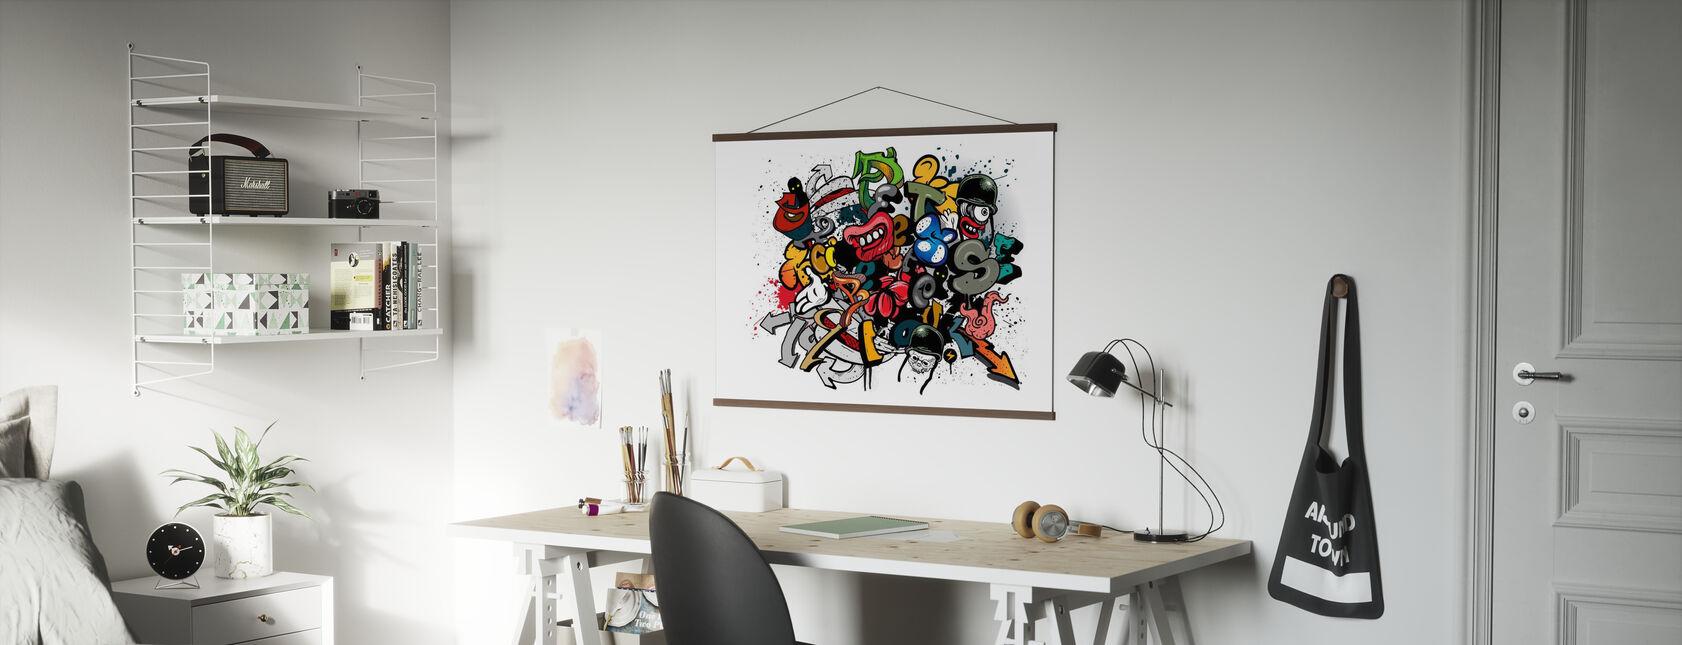 Graffiti-elementer - Plakat - Kontor